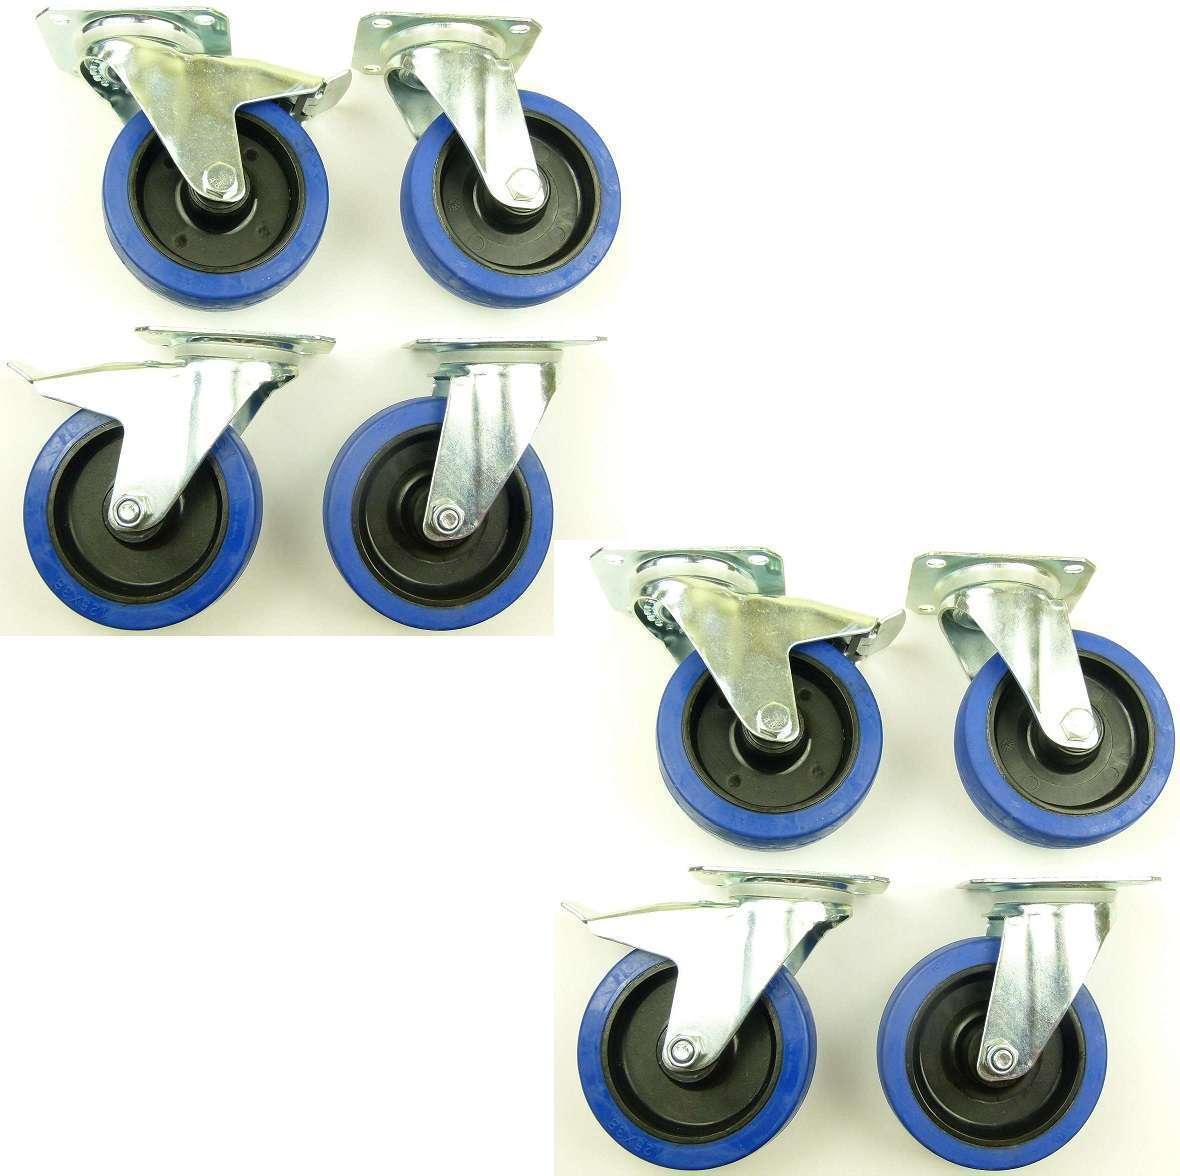 2 Set 125 mm SL Rollen BREMSE Transportrollen Lenkrollen Blau Wheels Schwerlast